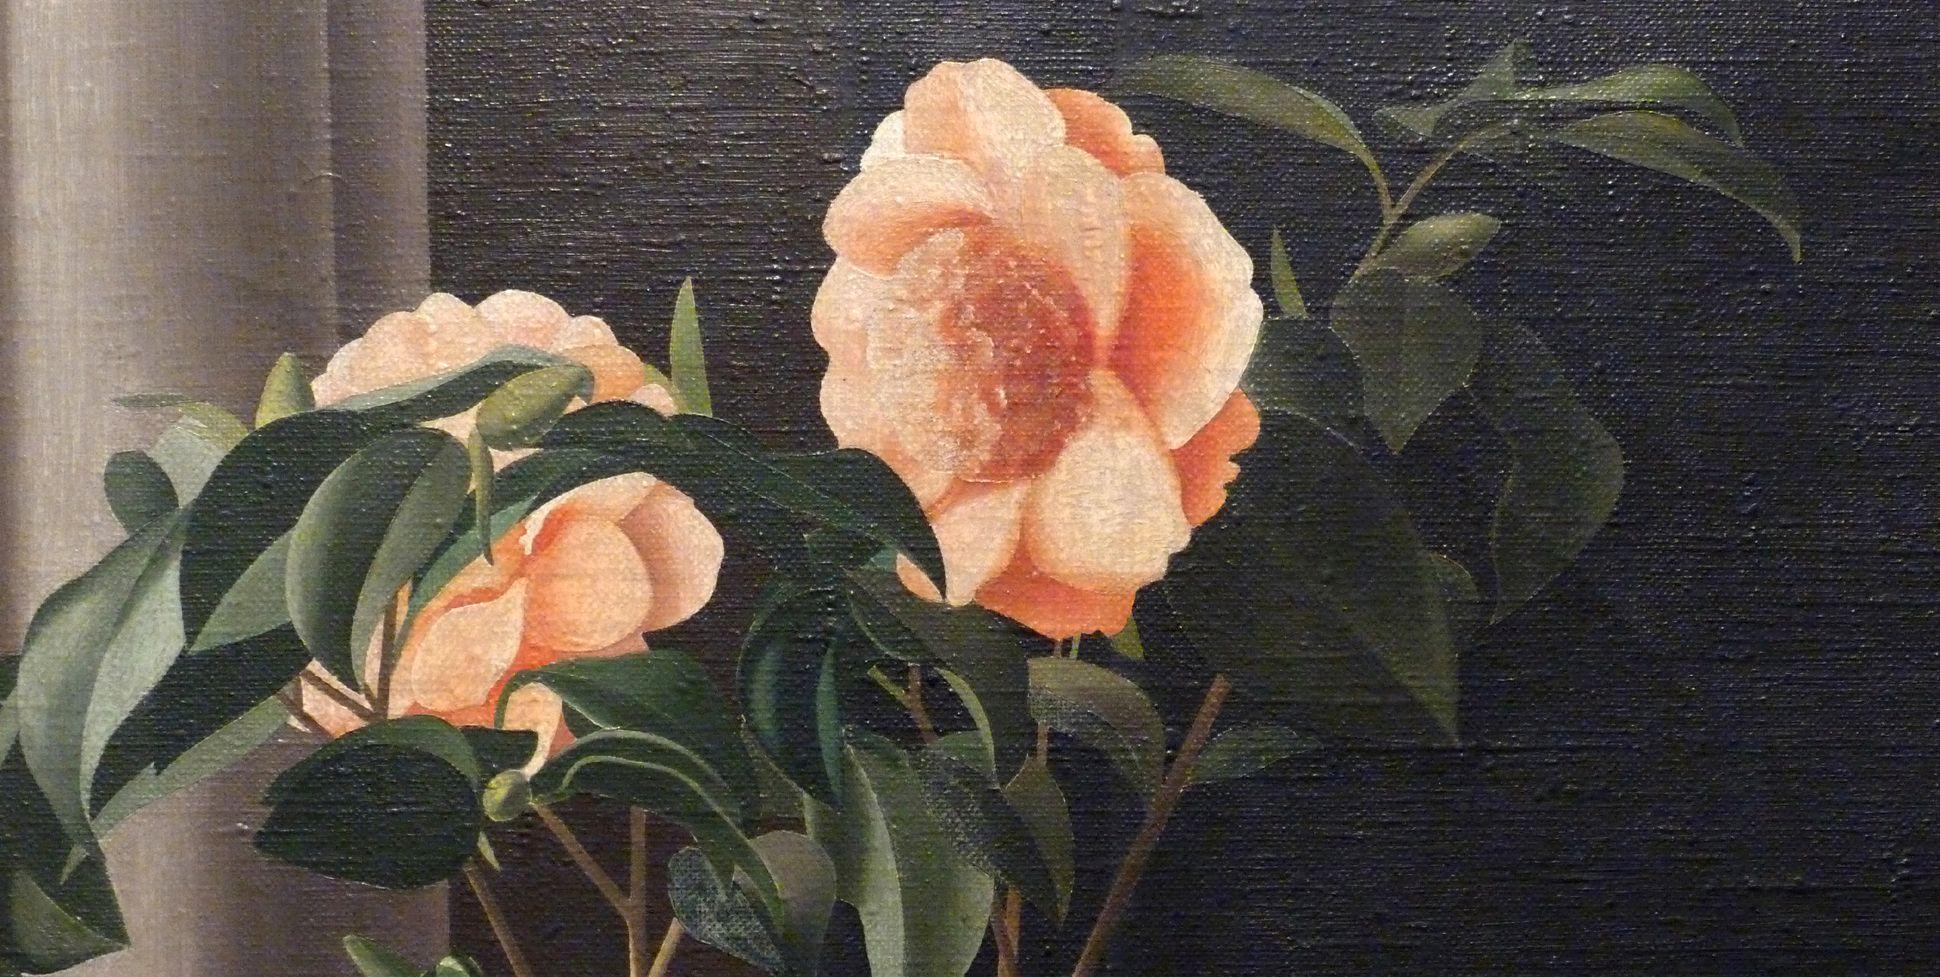 Flowering plant, camelia Detail, blossoms